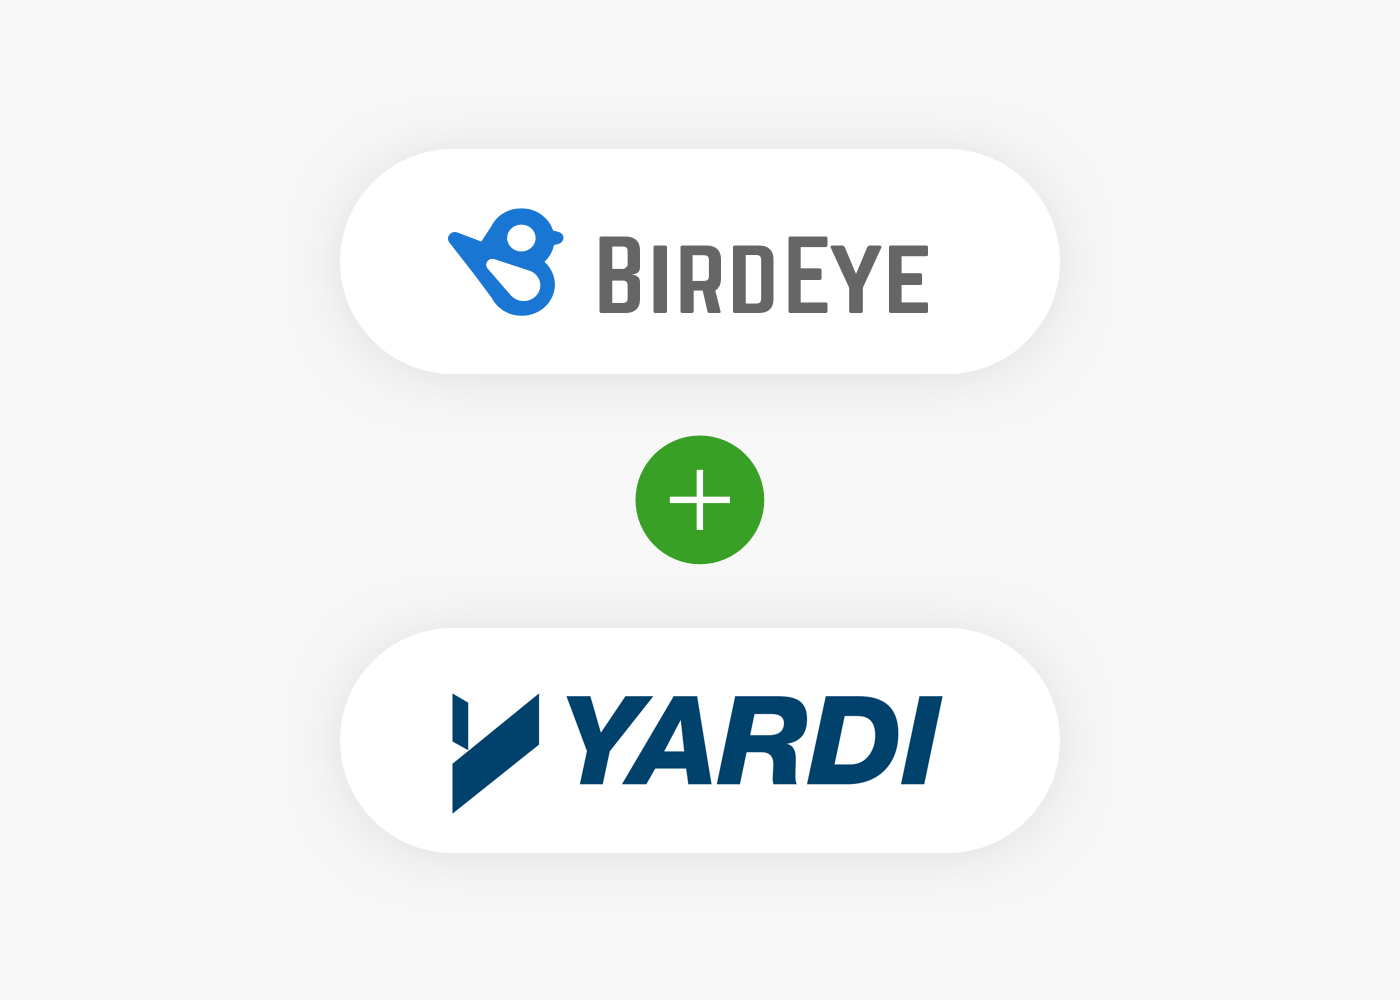 Birdeye And Yardi Partnership